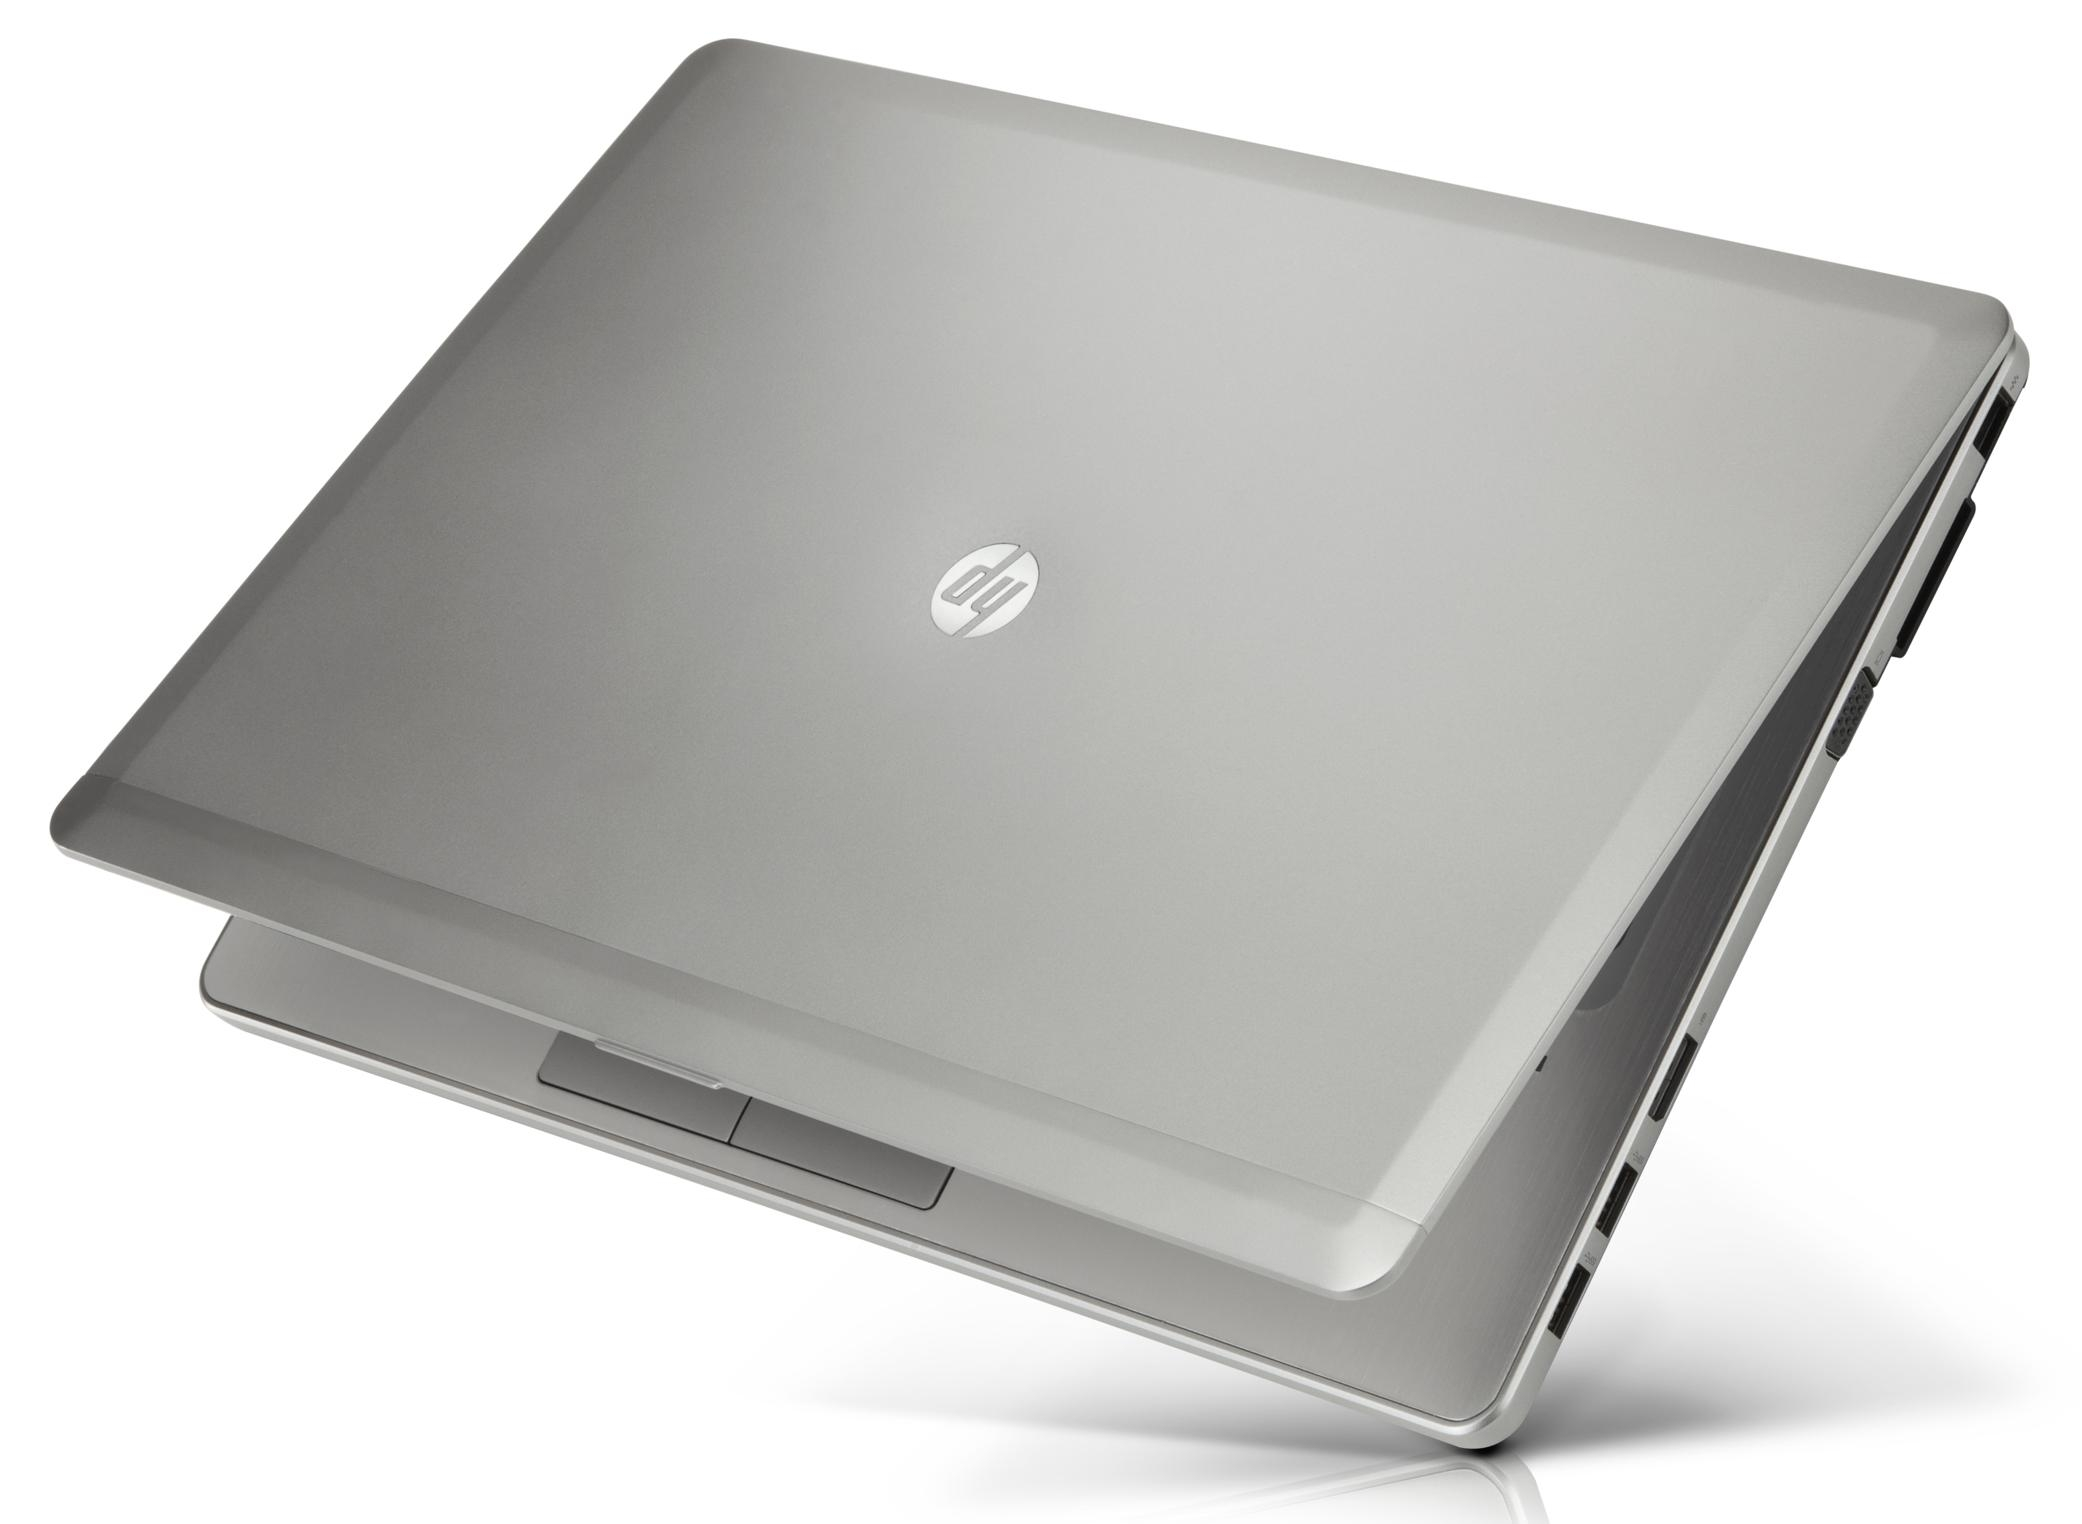 HP EliteBook Folio 9470m/ اولترابوکی قدرتمند برای حرفه ای ها